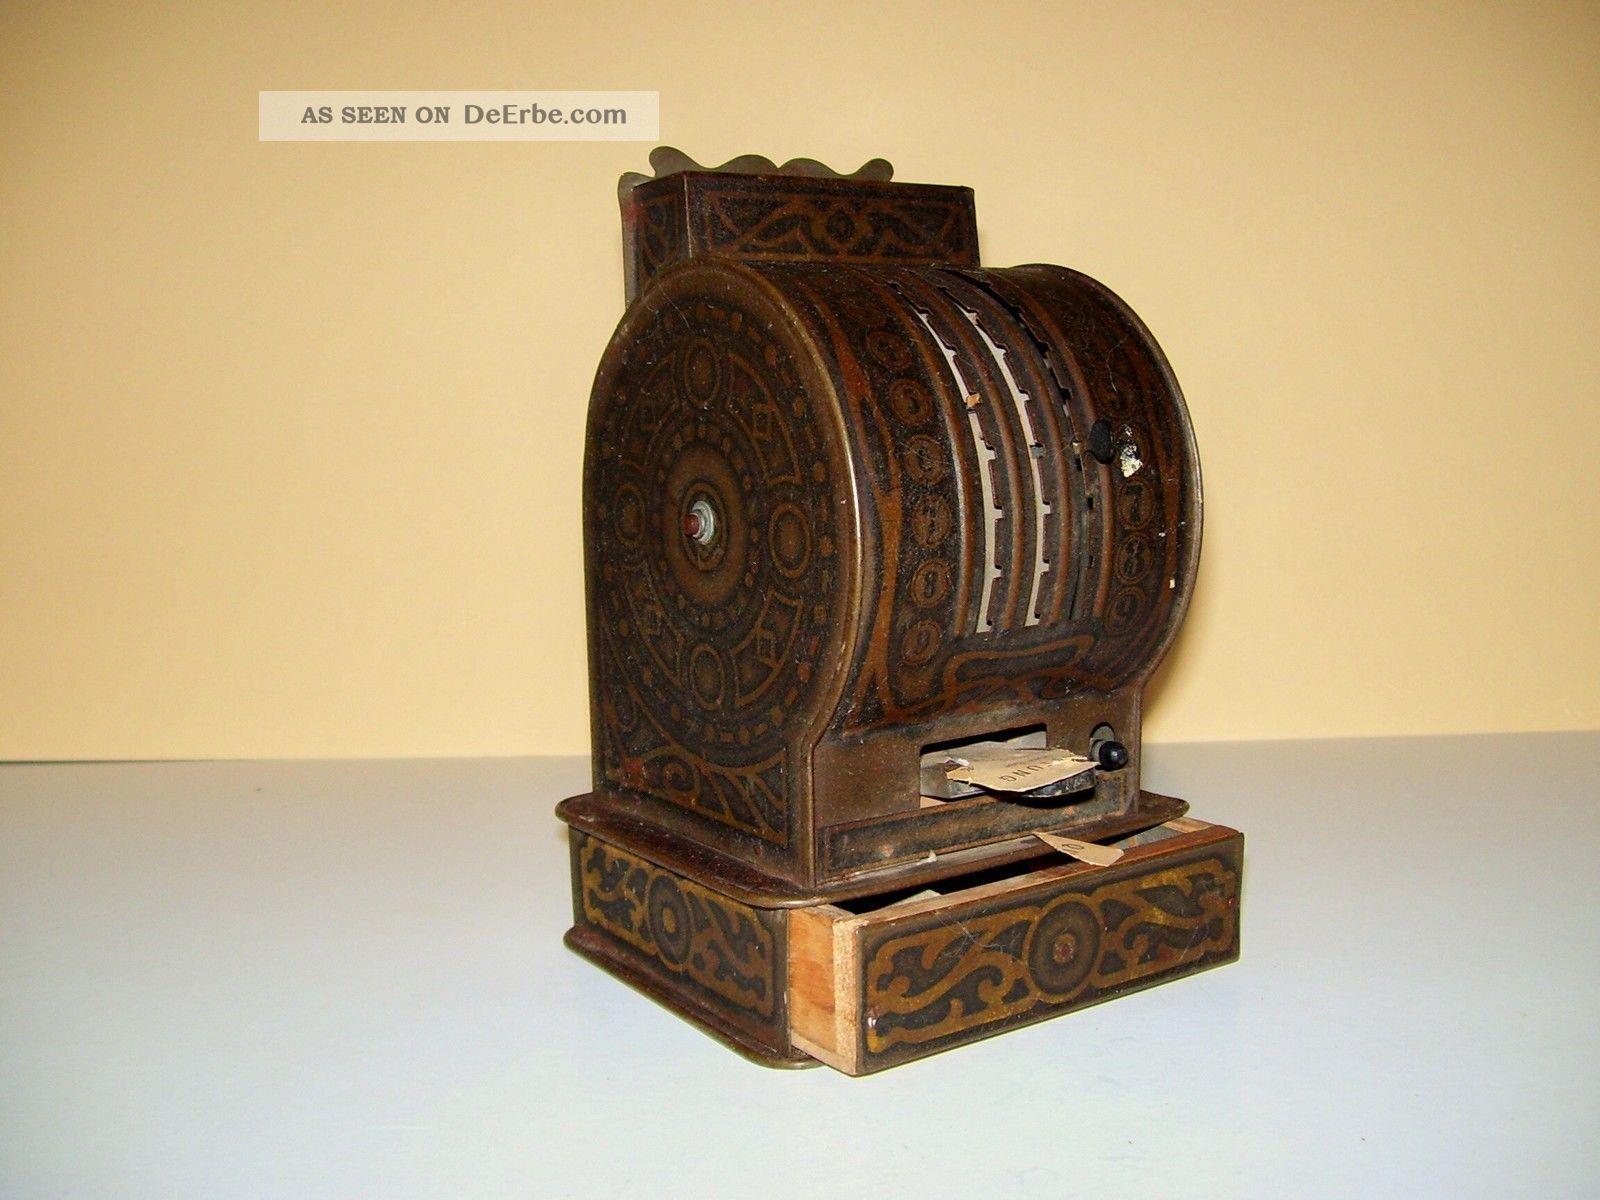 Rarität - Antike Kasse Aus Blech Lithografiert Vor 1900 F.  Kaufmannsladen Original, gefertigt vor 1945 Bild